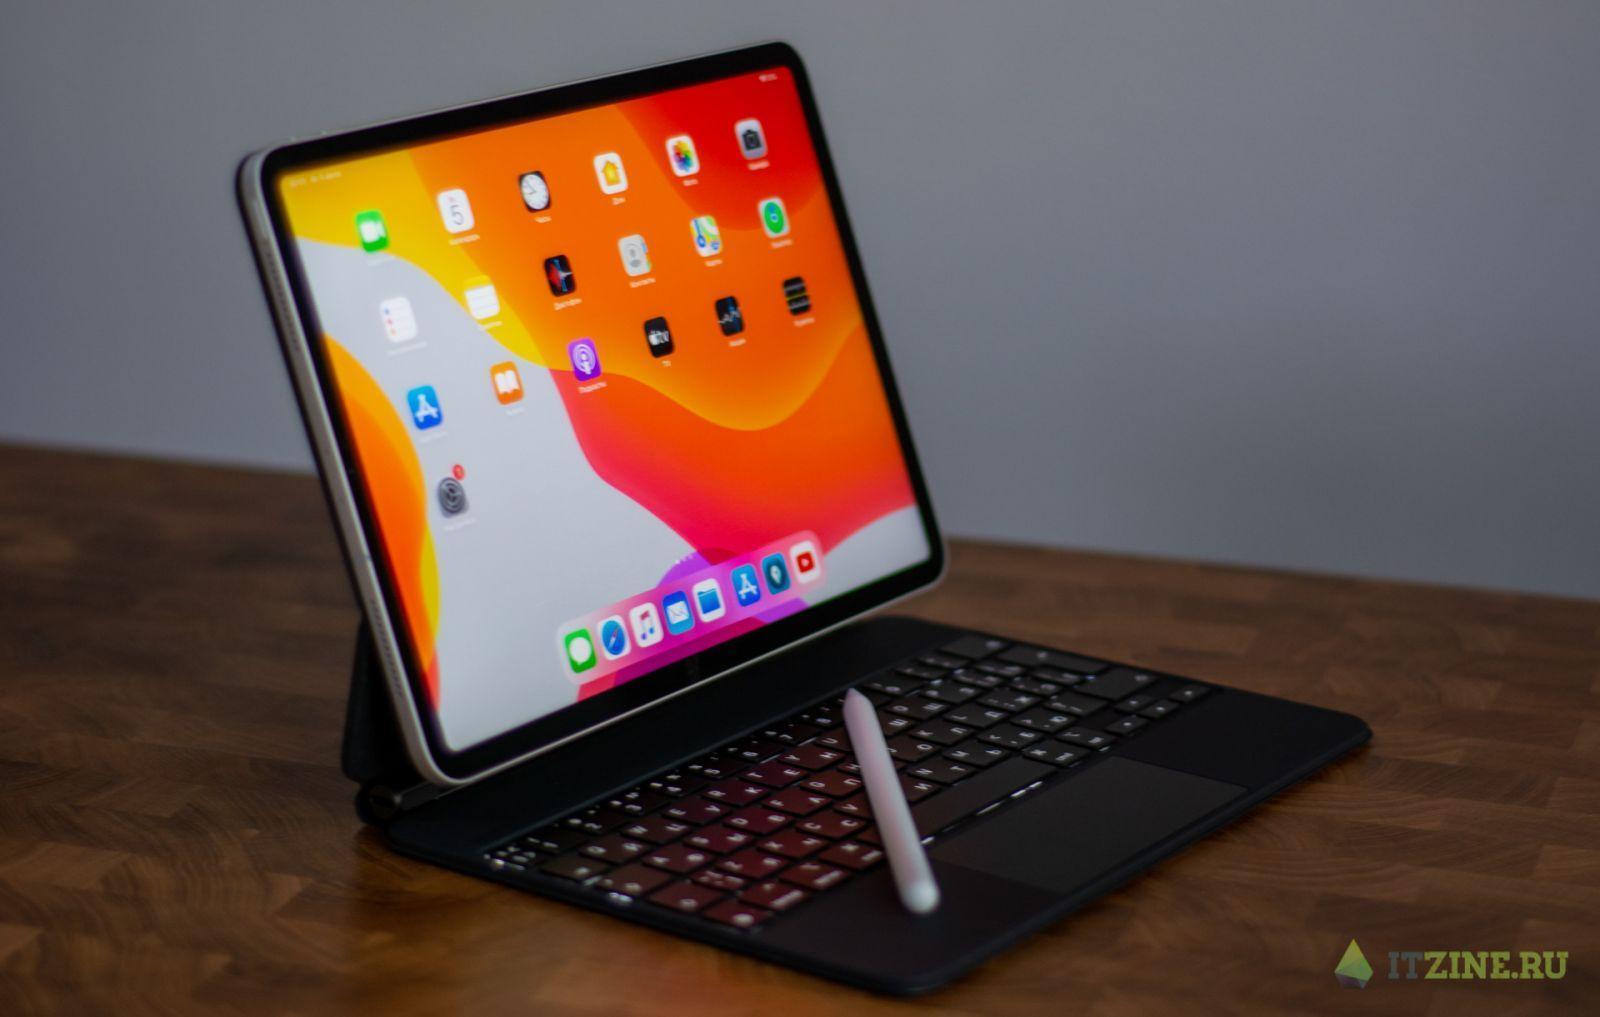 Дизайнерский рай. Обзор Apple iPad Pro 2020 + Apple Pencil + Magic Keyboard (dsc 8855)